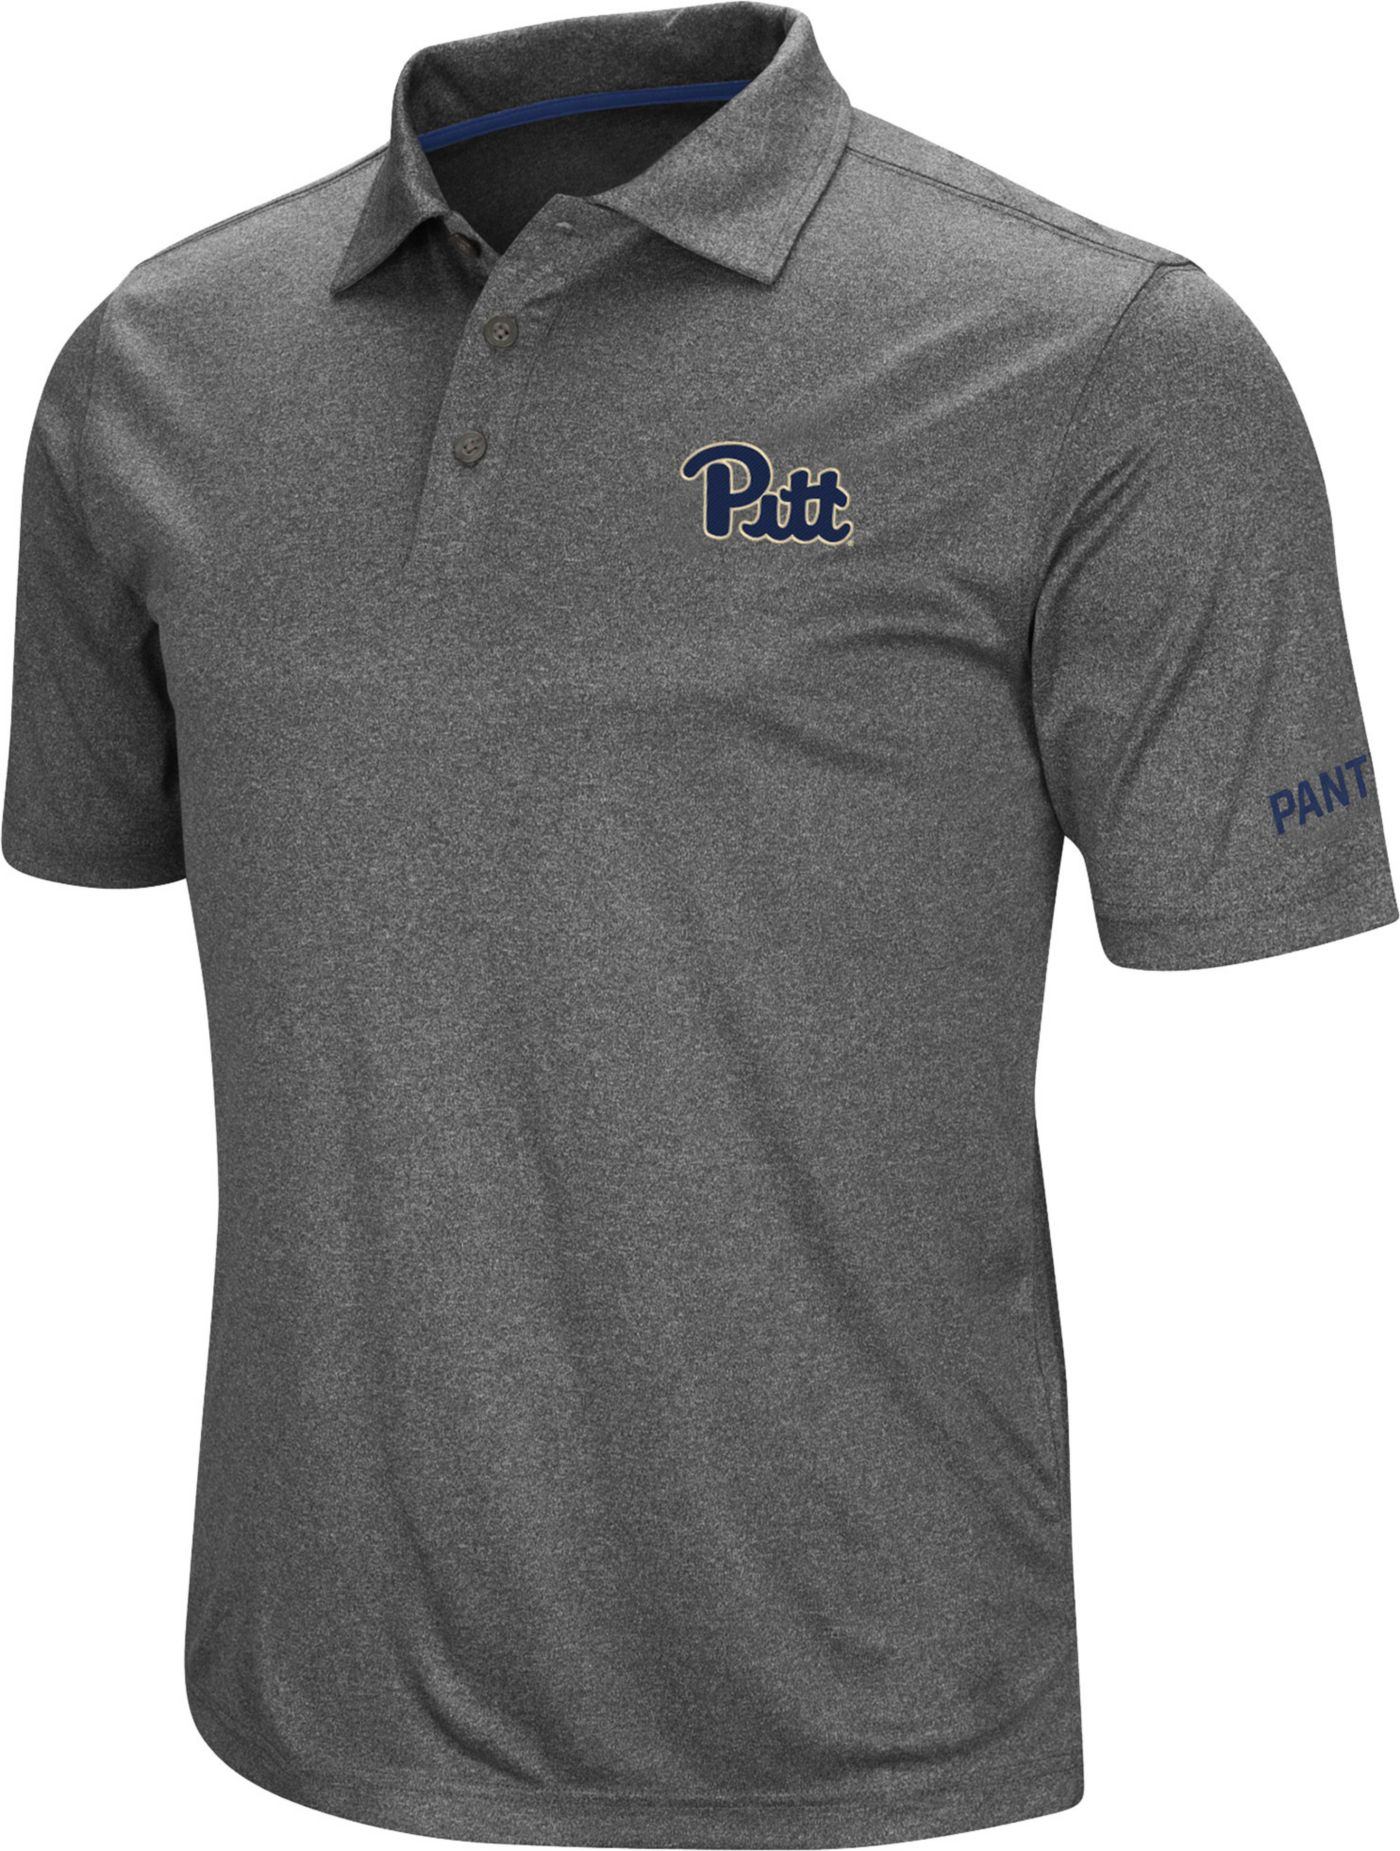 Colosseum Men's Pitt Panthers Grey Cut Shot Polo